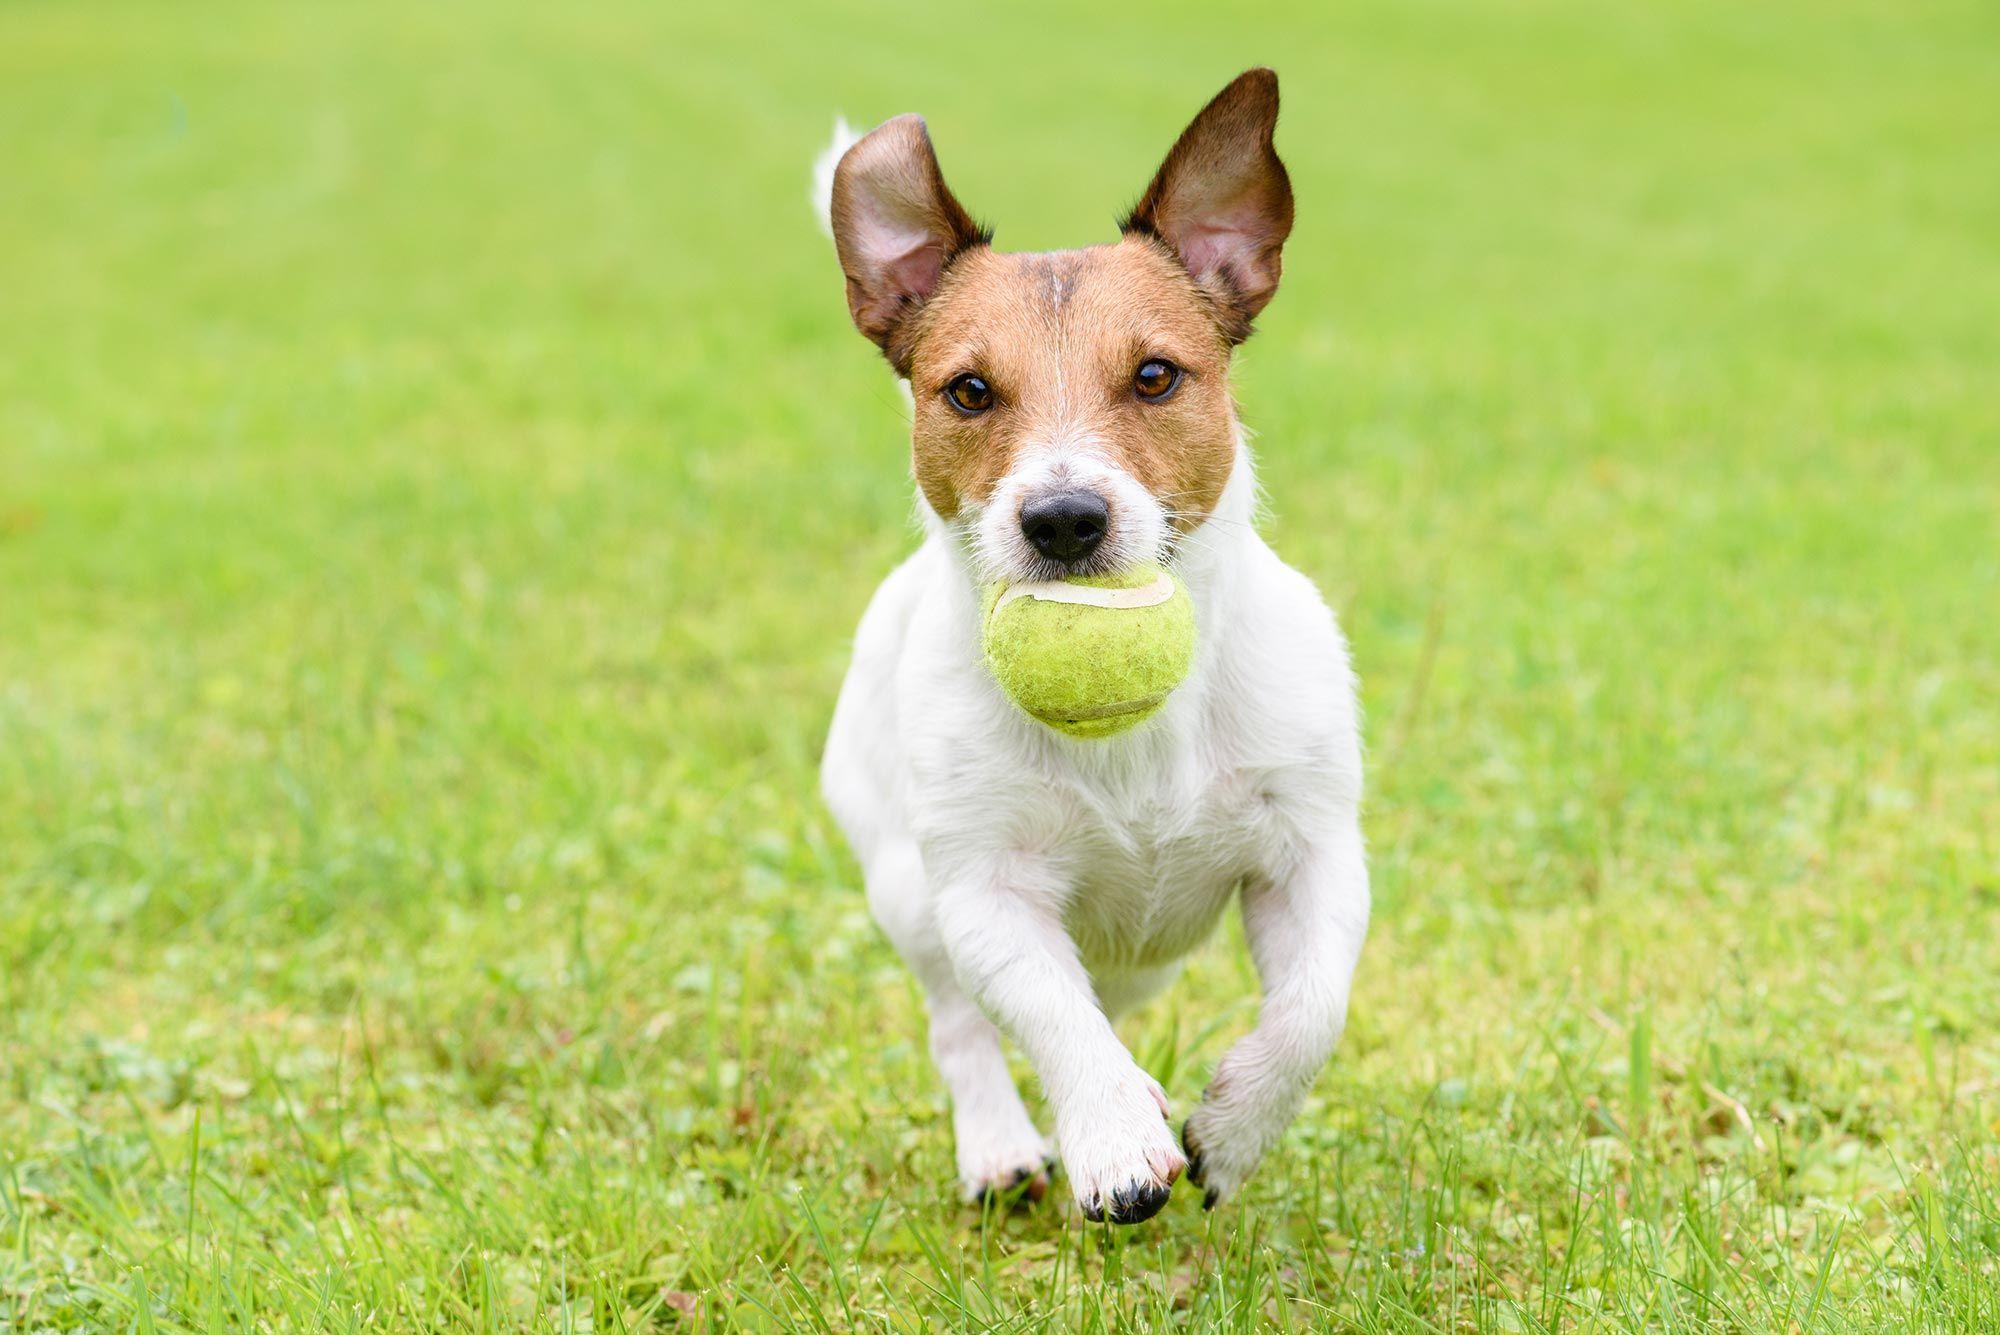 perros juego pelota